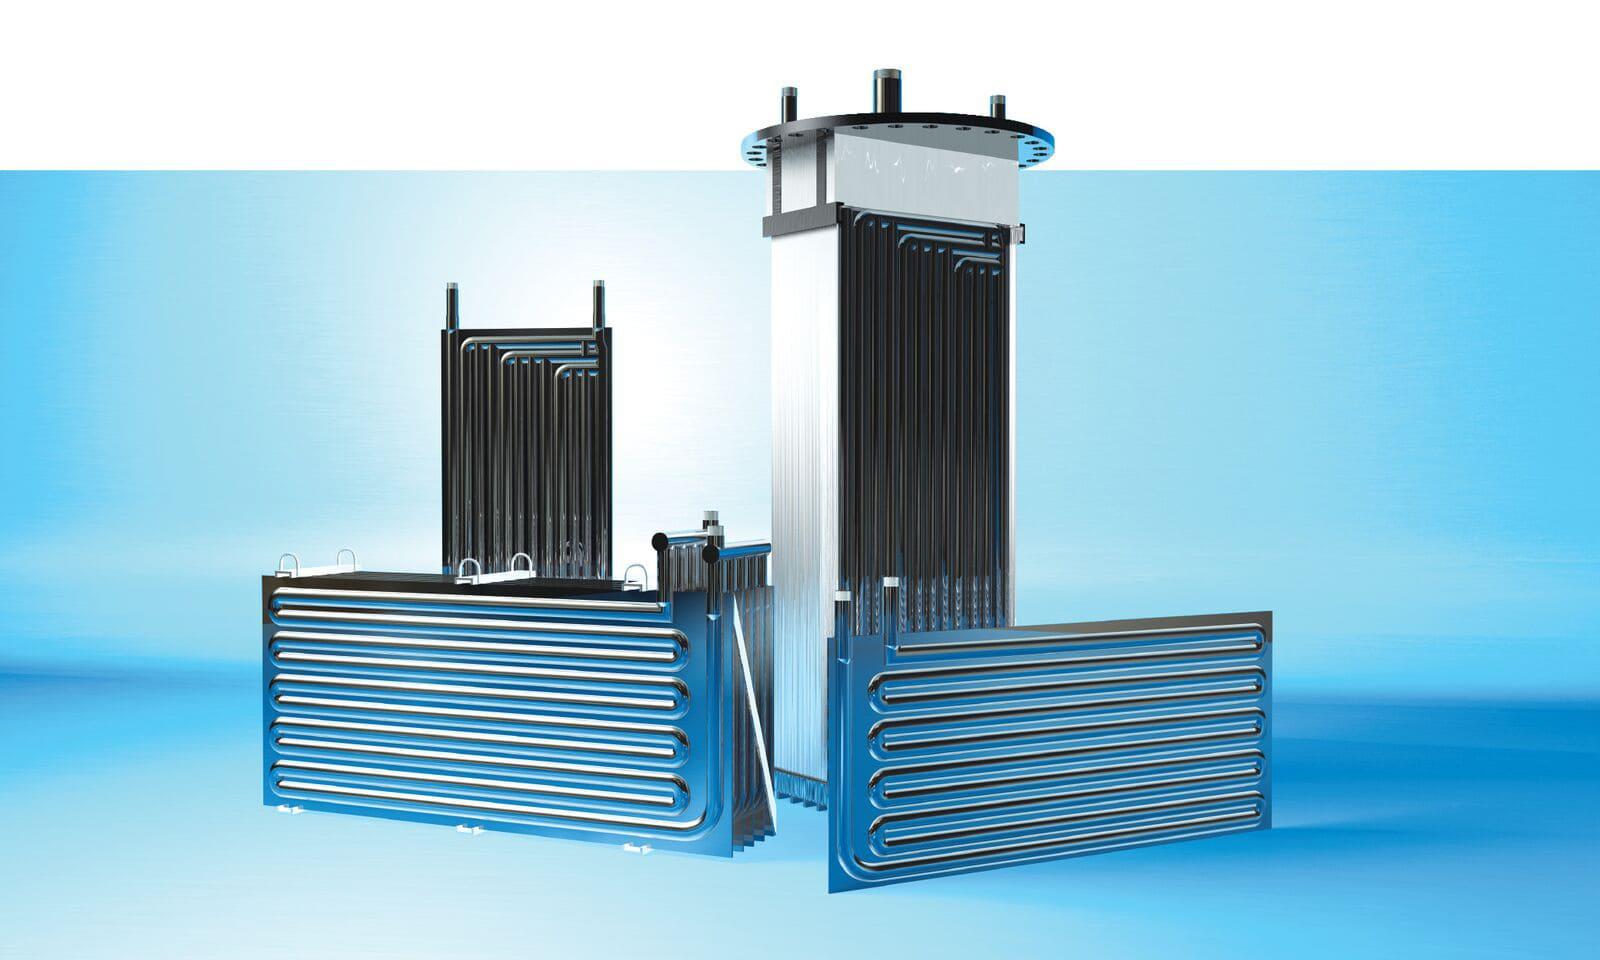 Plate Coil 1 - Теплообменники Tranter (Трантер)